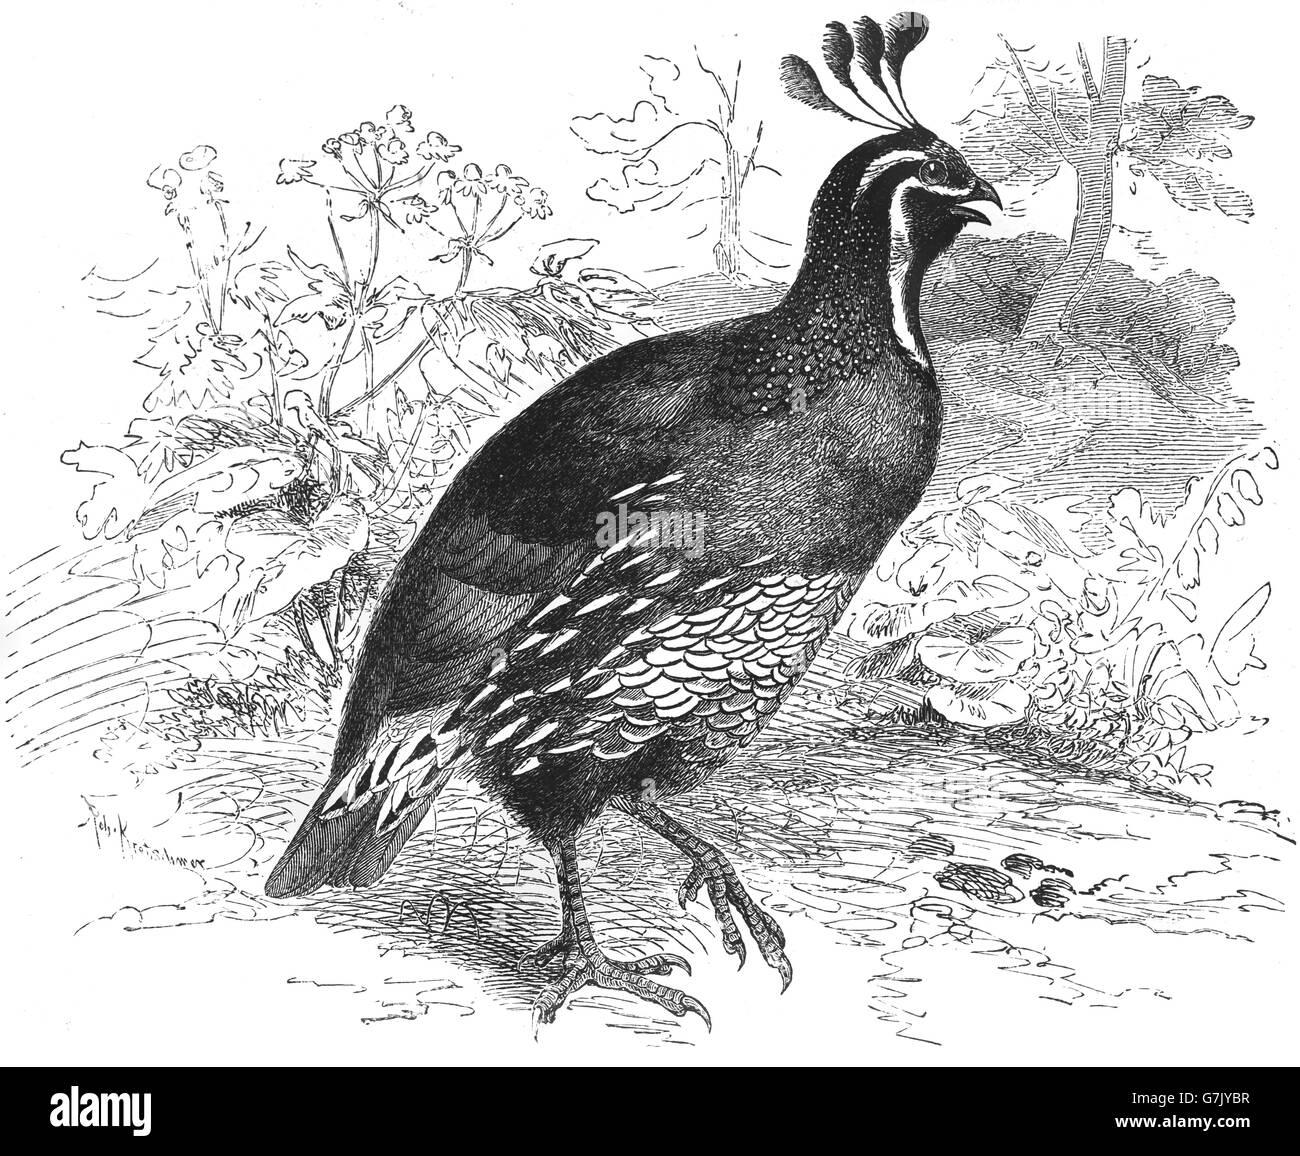 california quail callipepla californica california valley quail illustration from book dated 1904